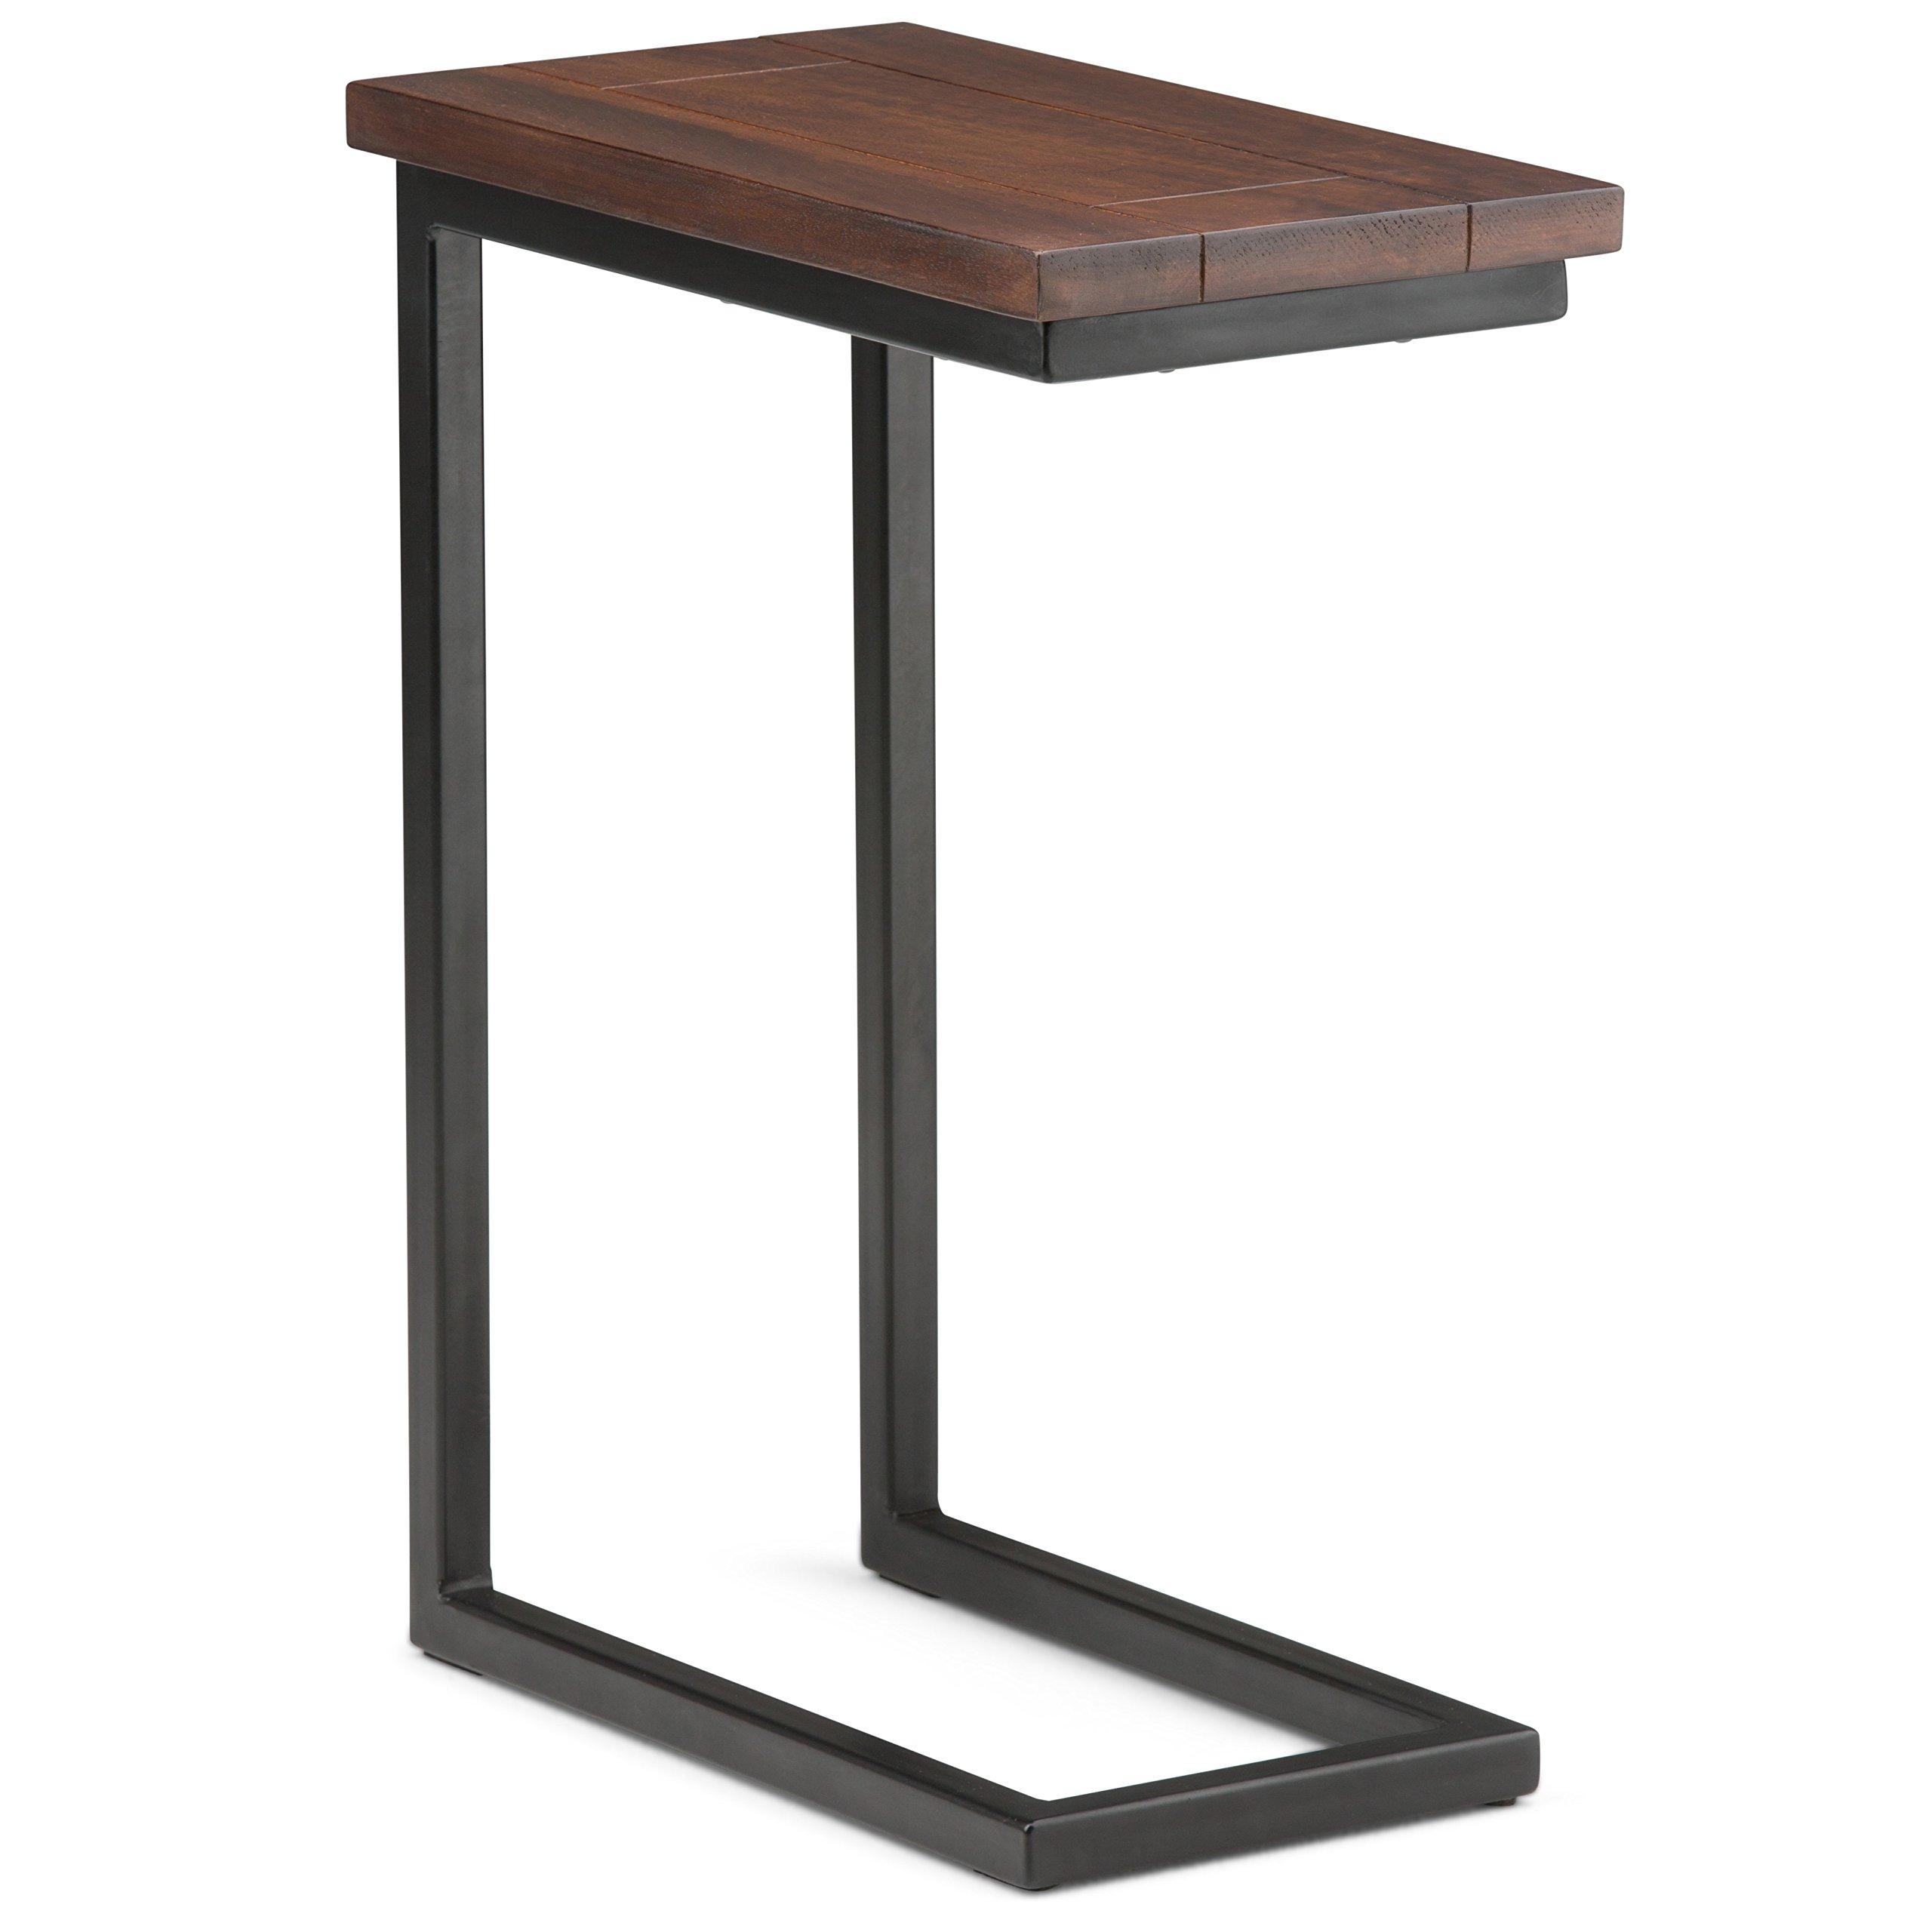 Simpli Home 3AXCSKY-09 Skyler Solid Mango Wood and Metal 18 inch Wide Modern Industrial C Side Table in Dark Cognac Brown, Fully Assembled by Simpli Home